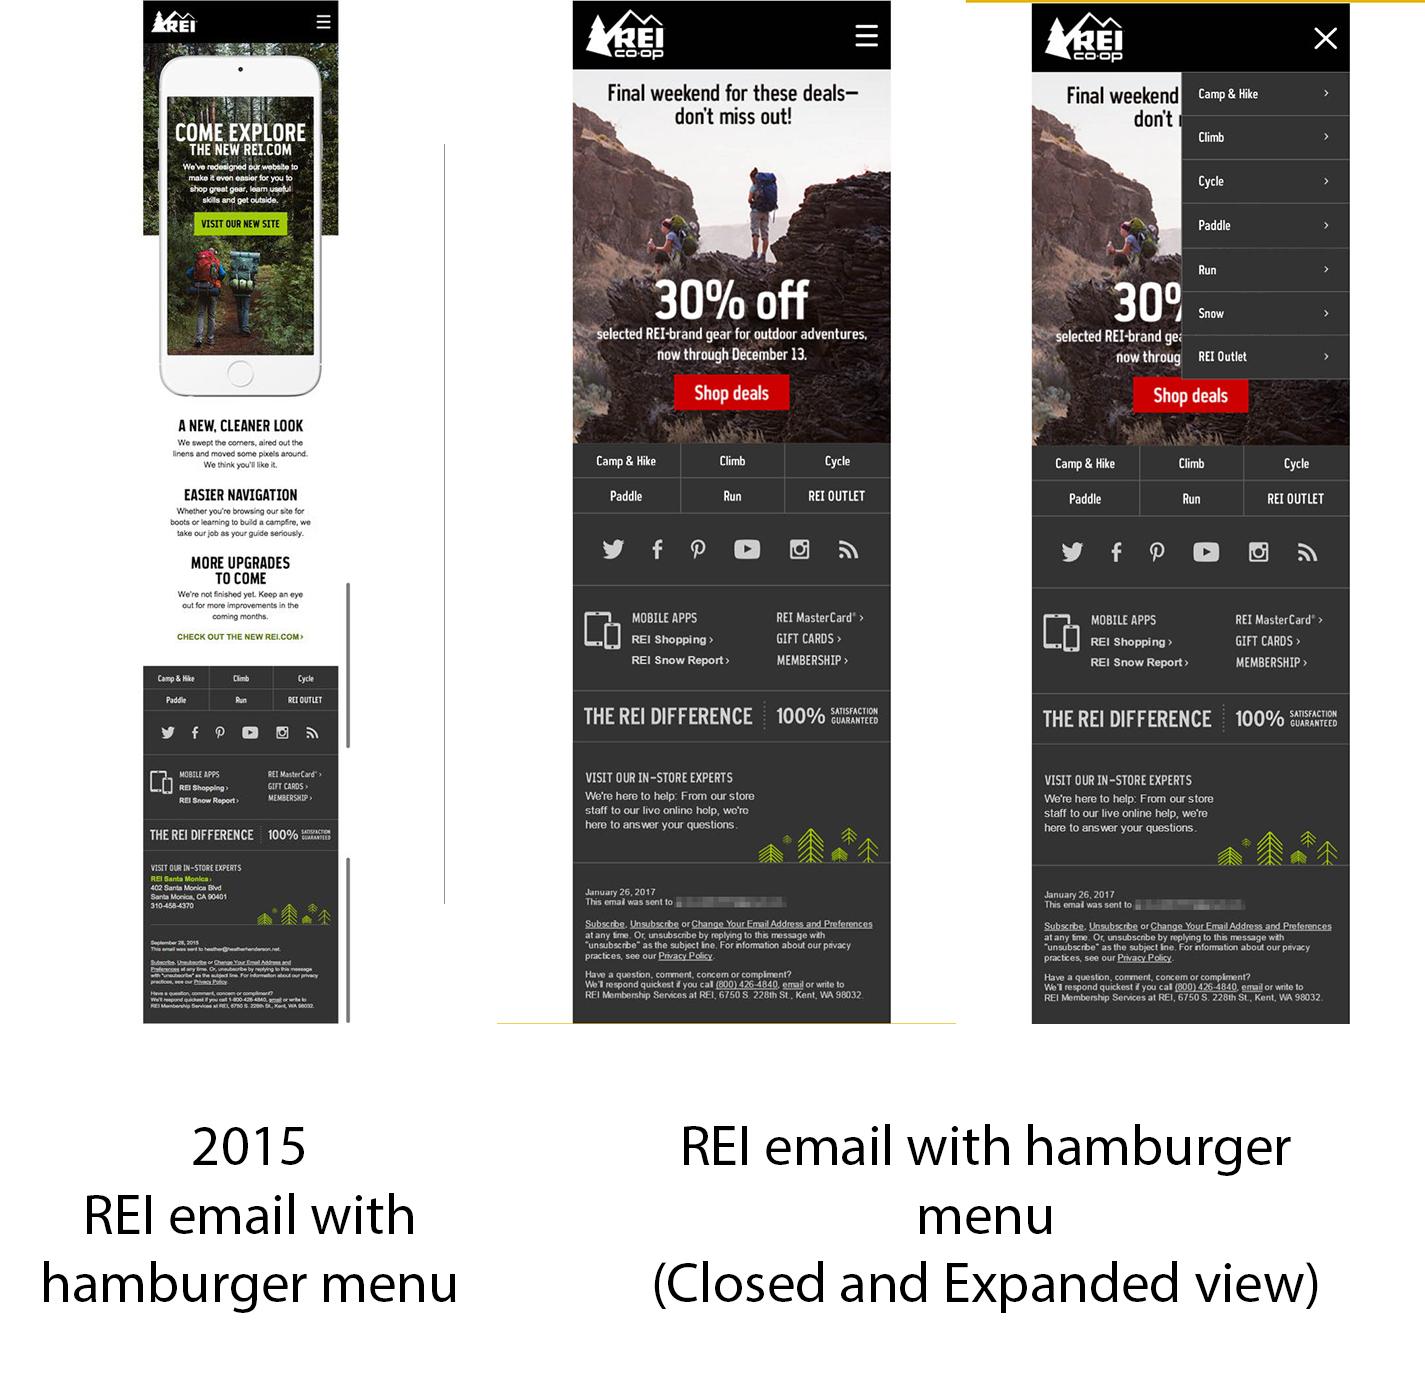 Menu-in-emails-REI-menu-example